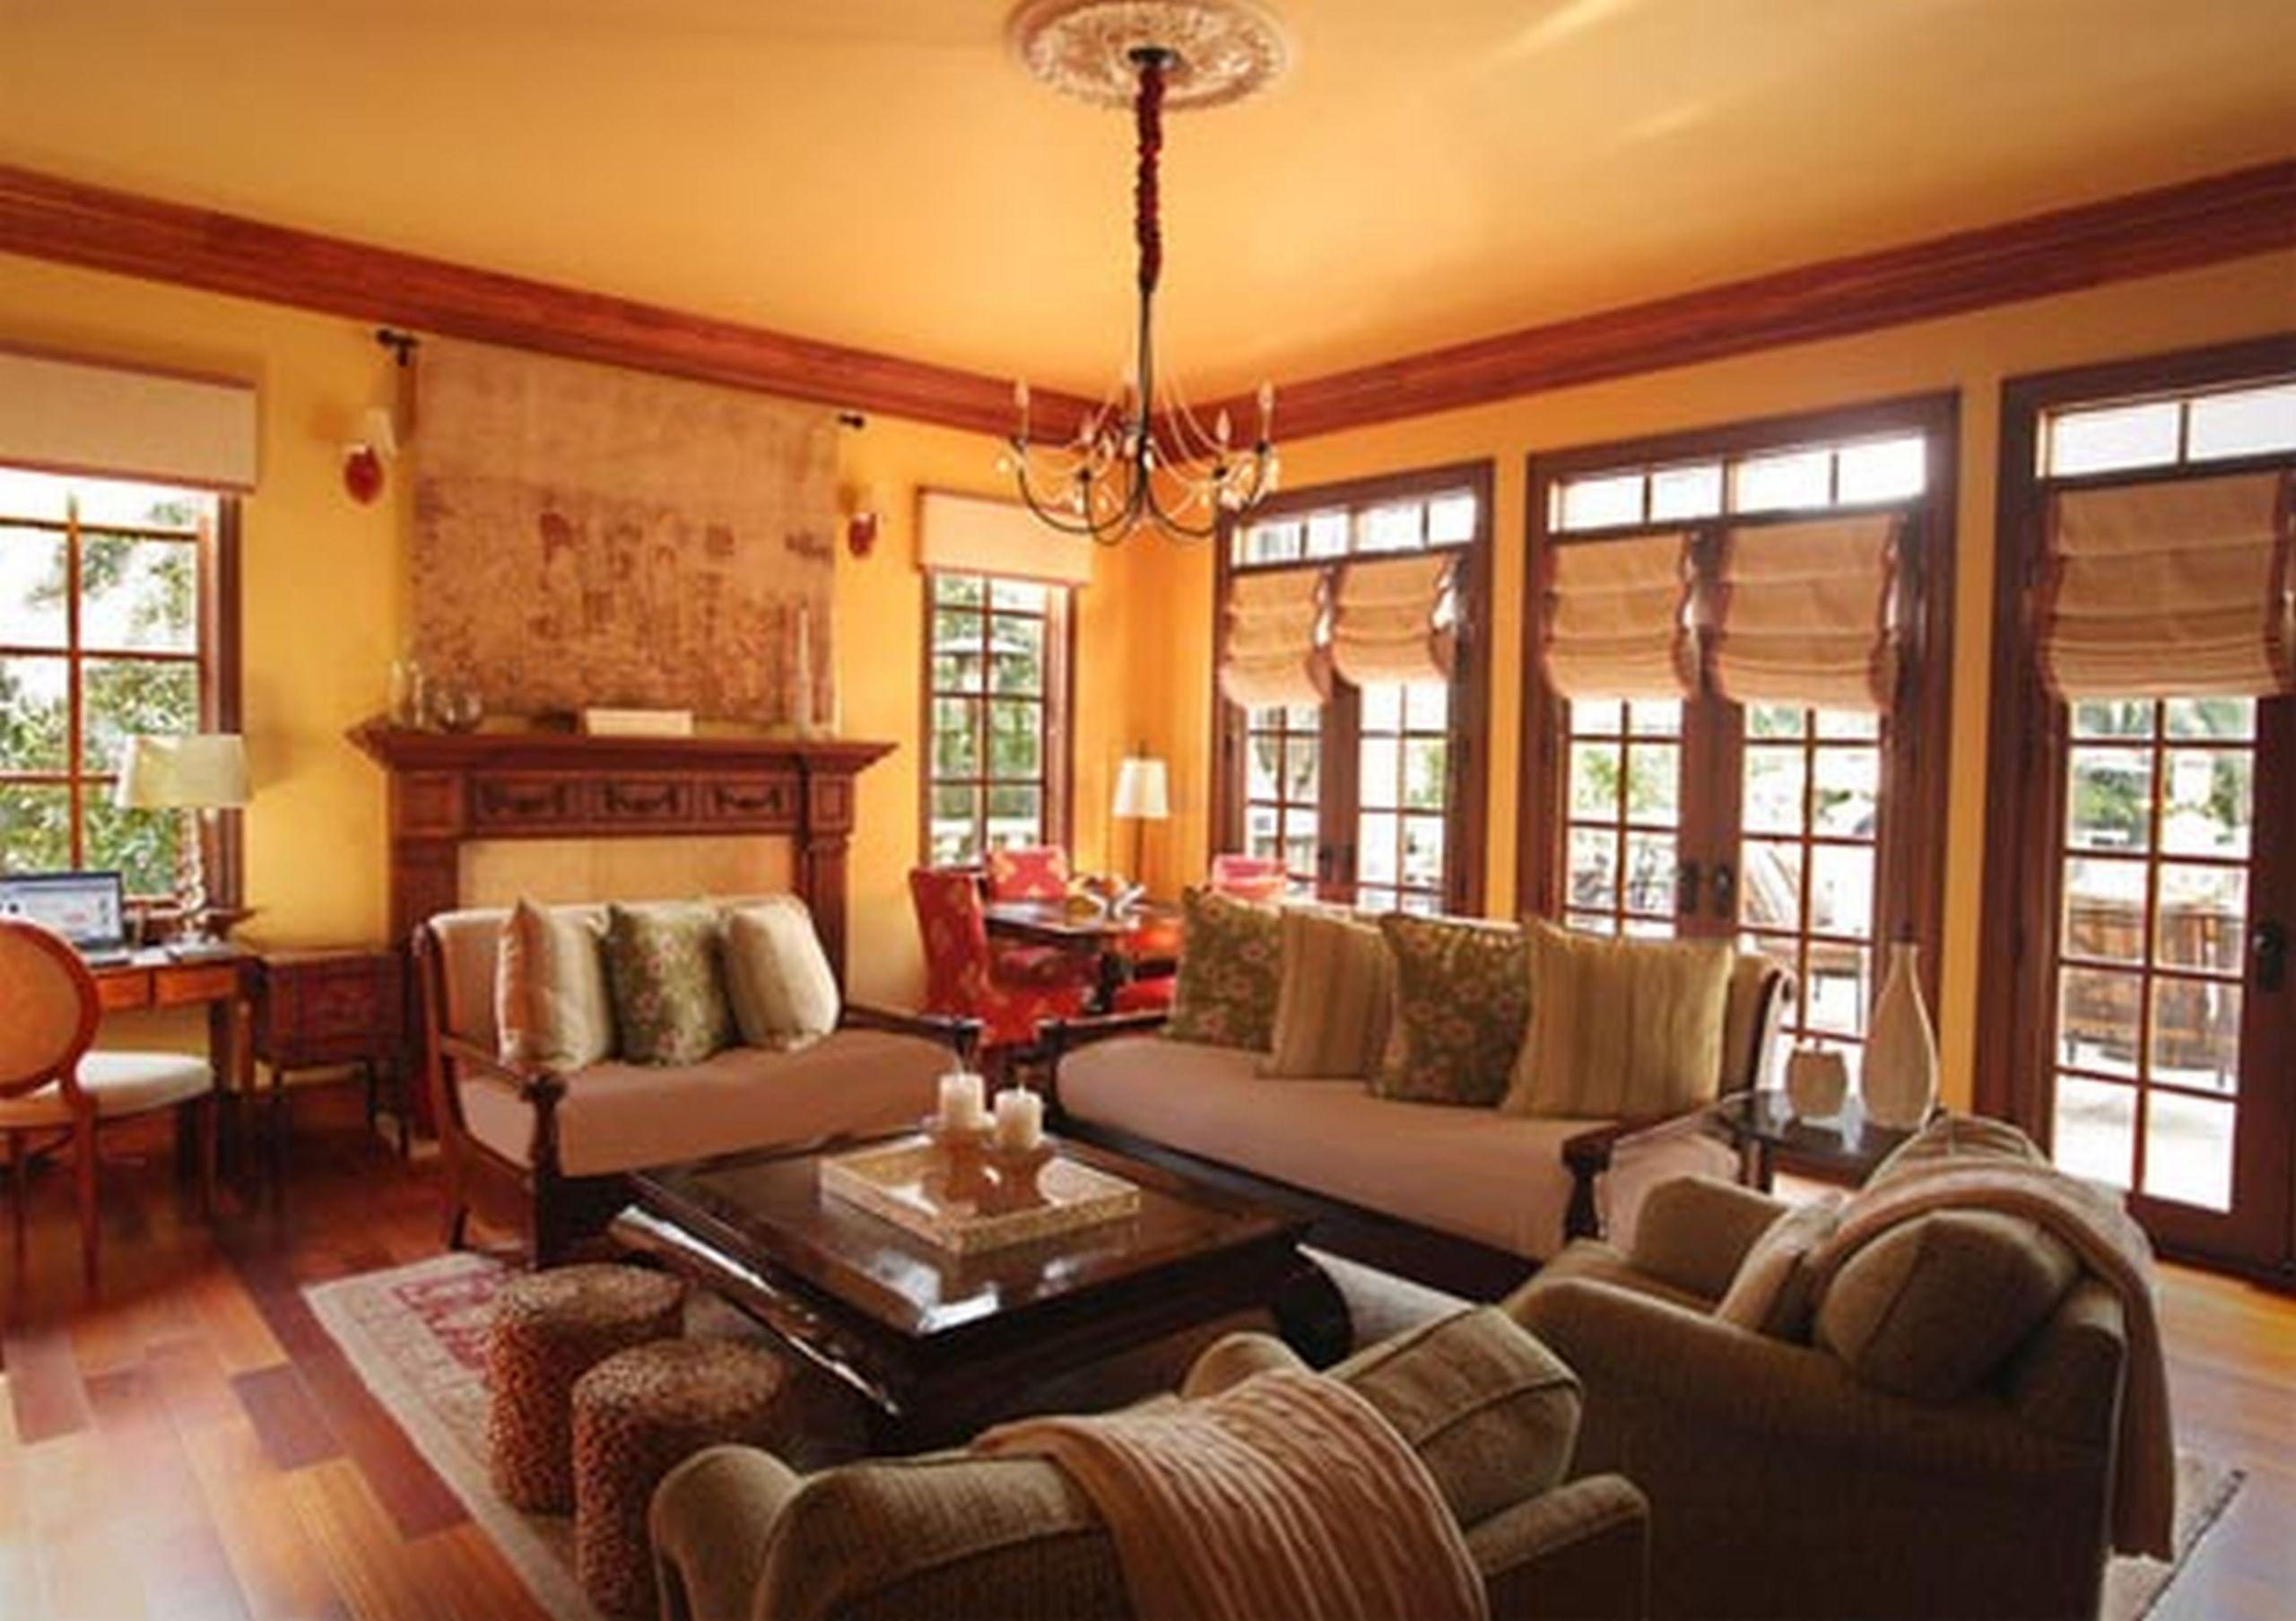 Rustic Living Room Photos  Rustic Living Room Ideas – HomesFeed